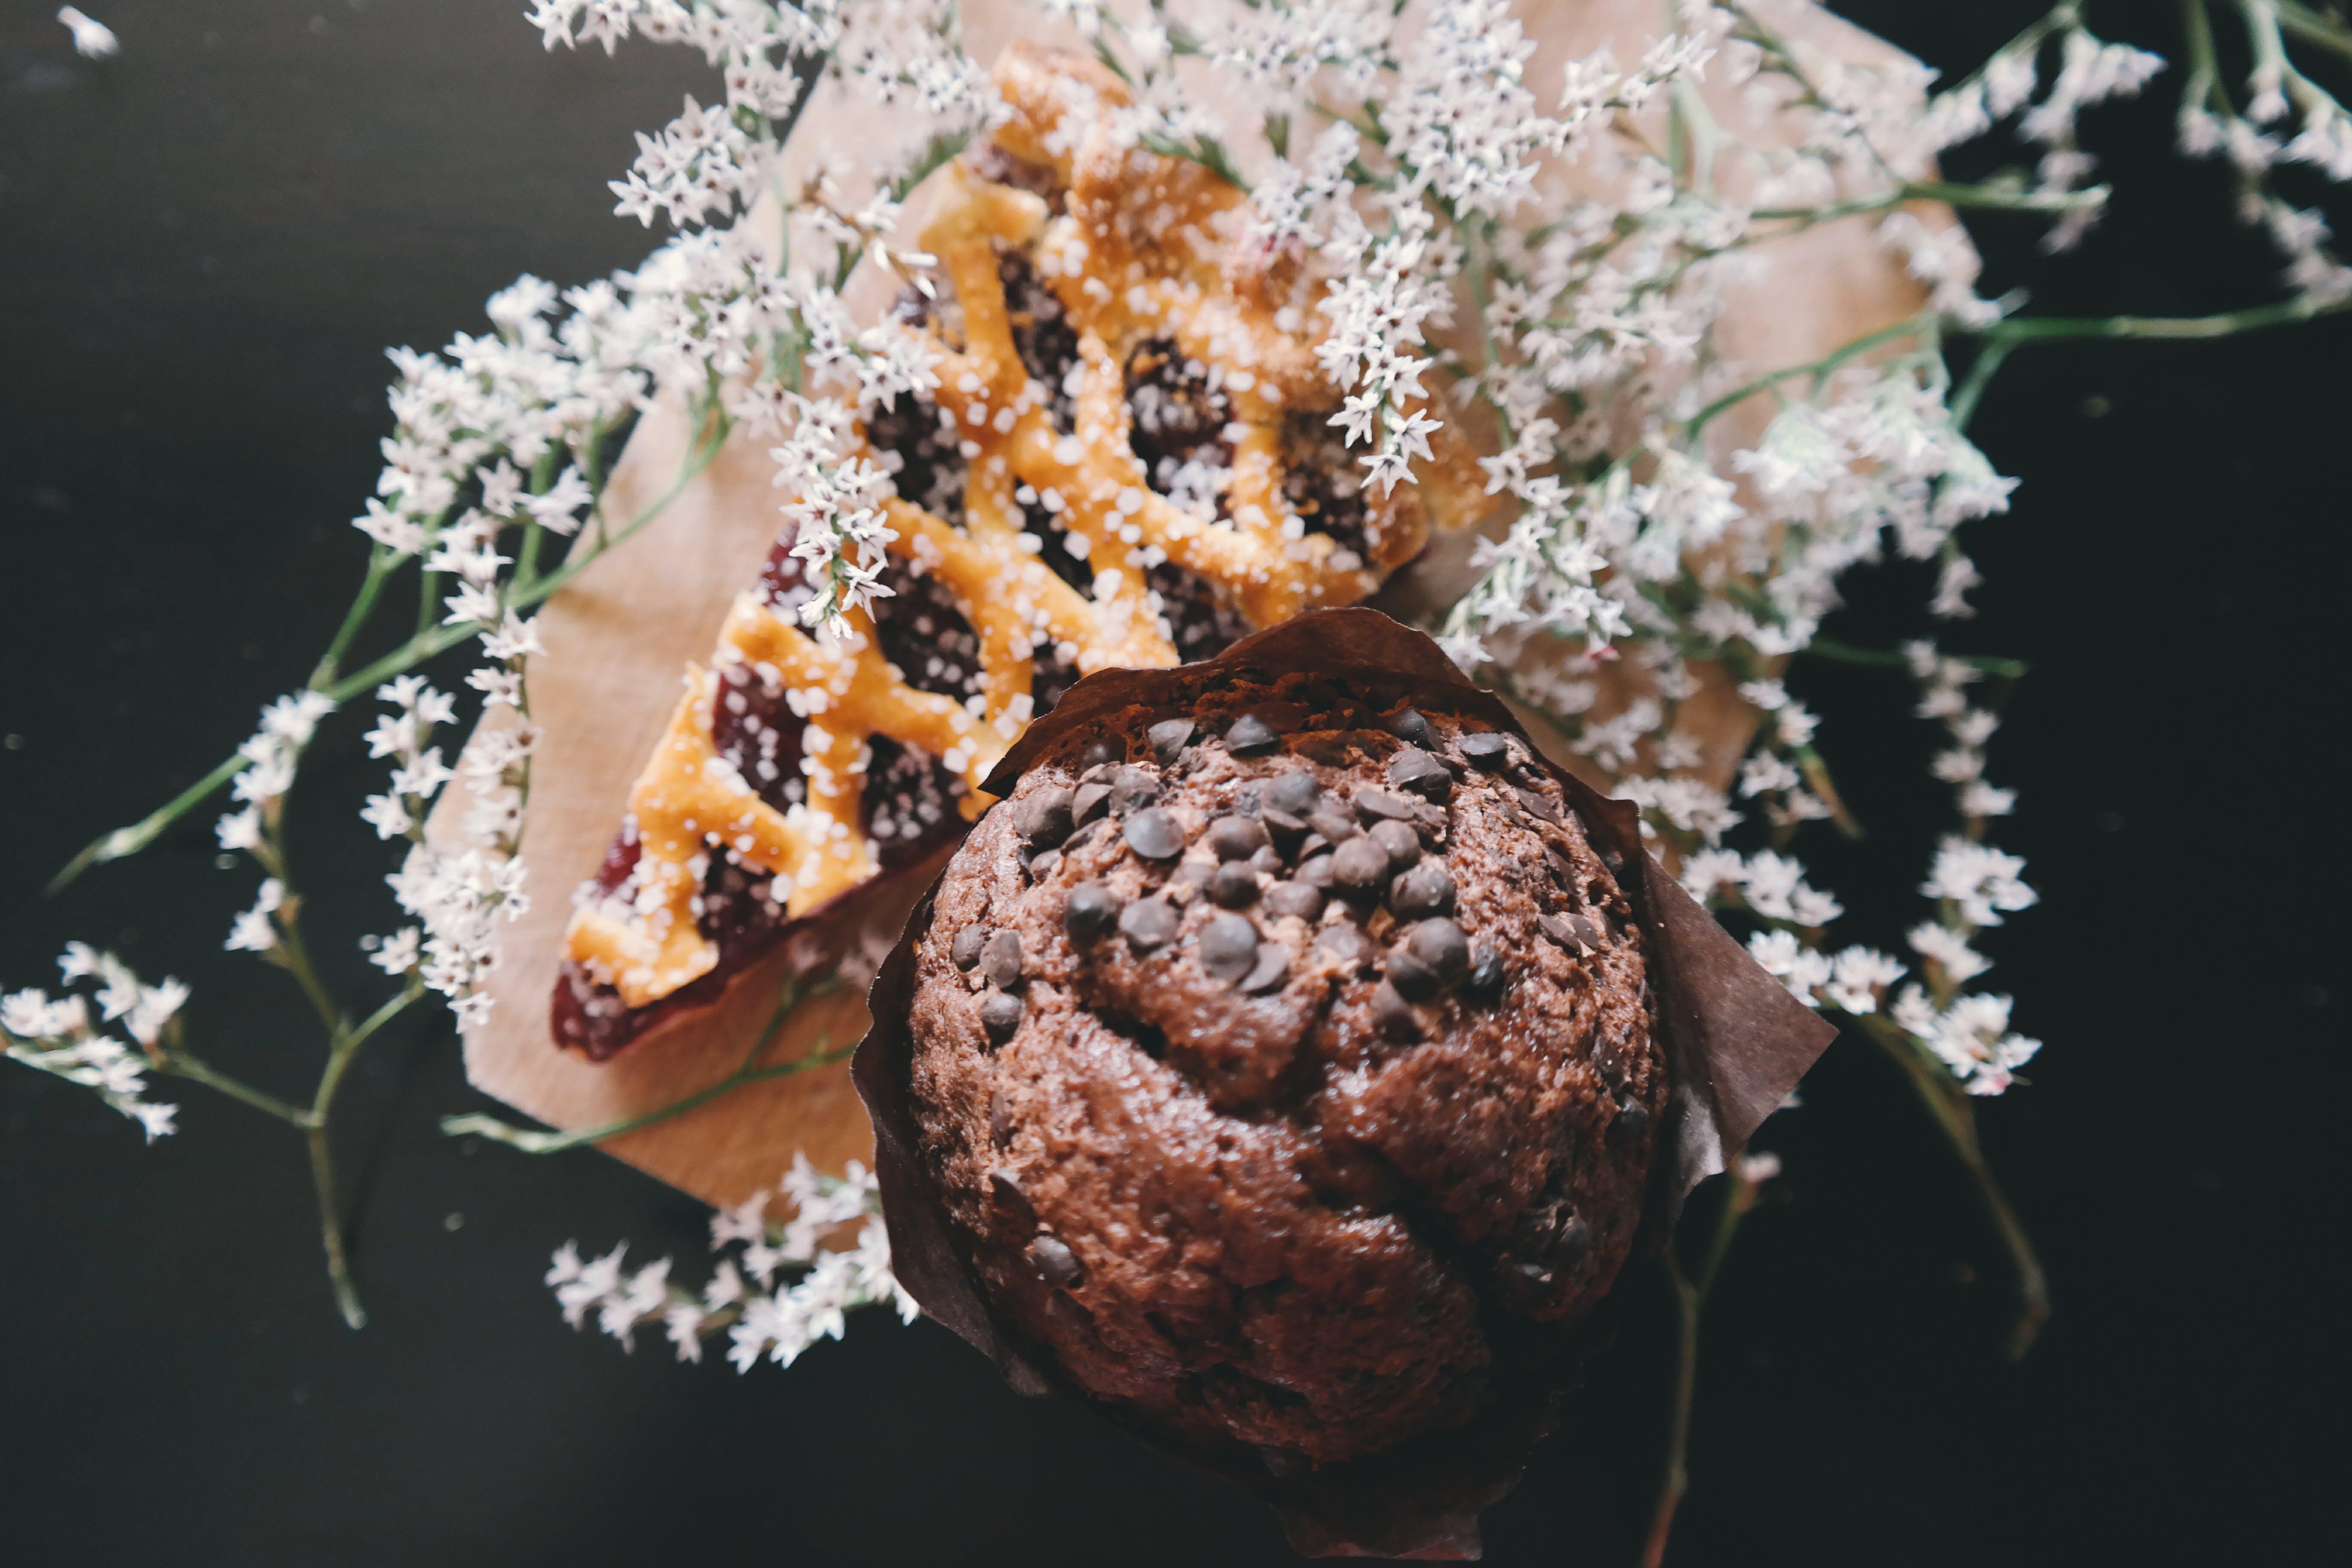 chocolate muffin, desserts, flowers